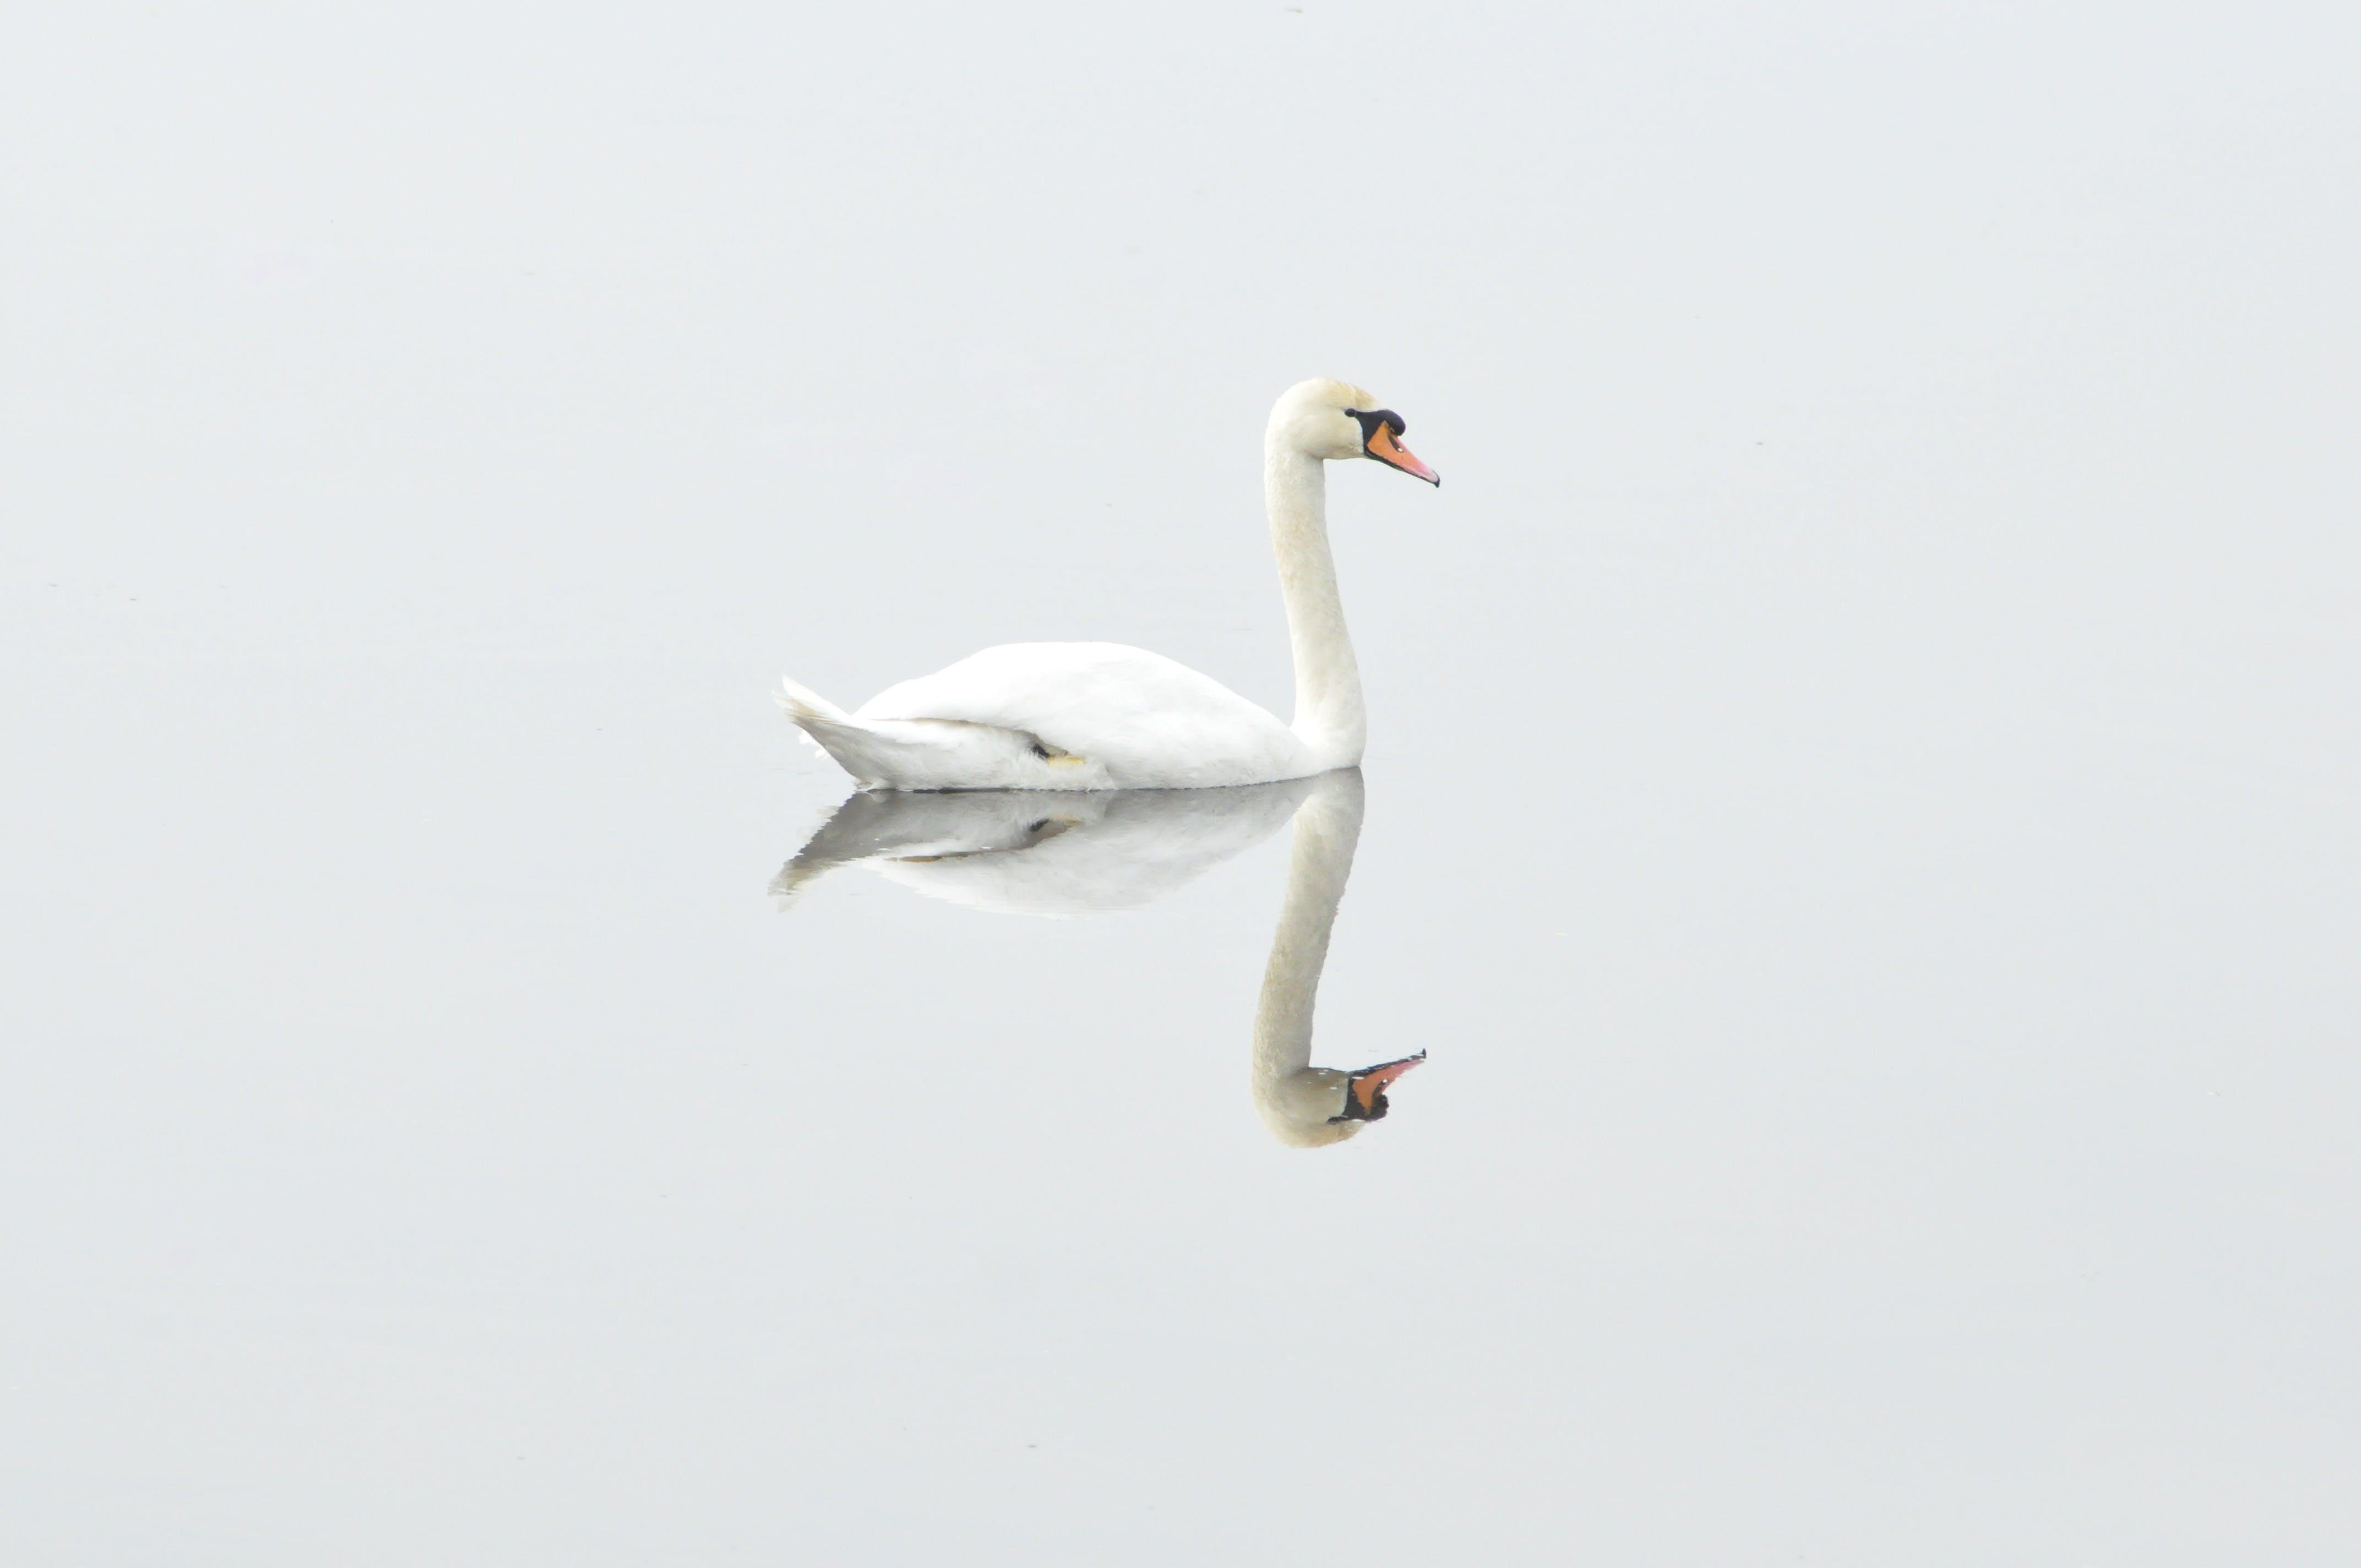 Free stock photo of bird, water, animal, reflection